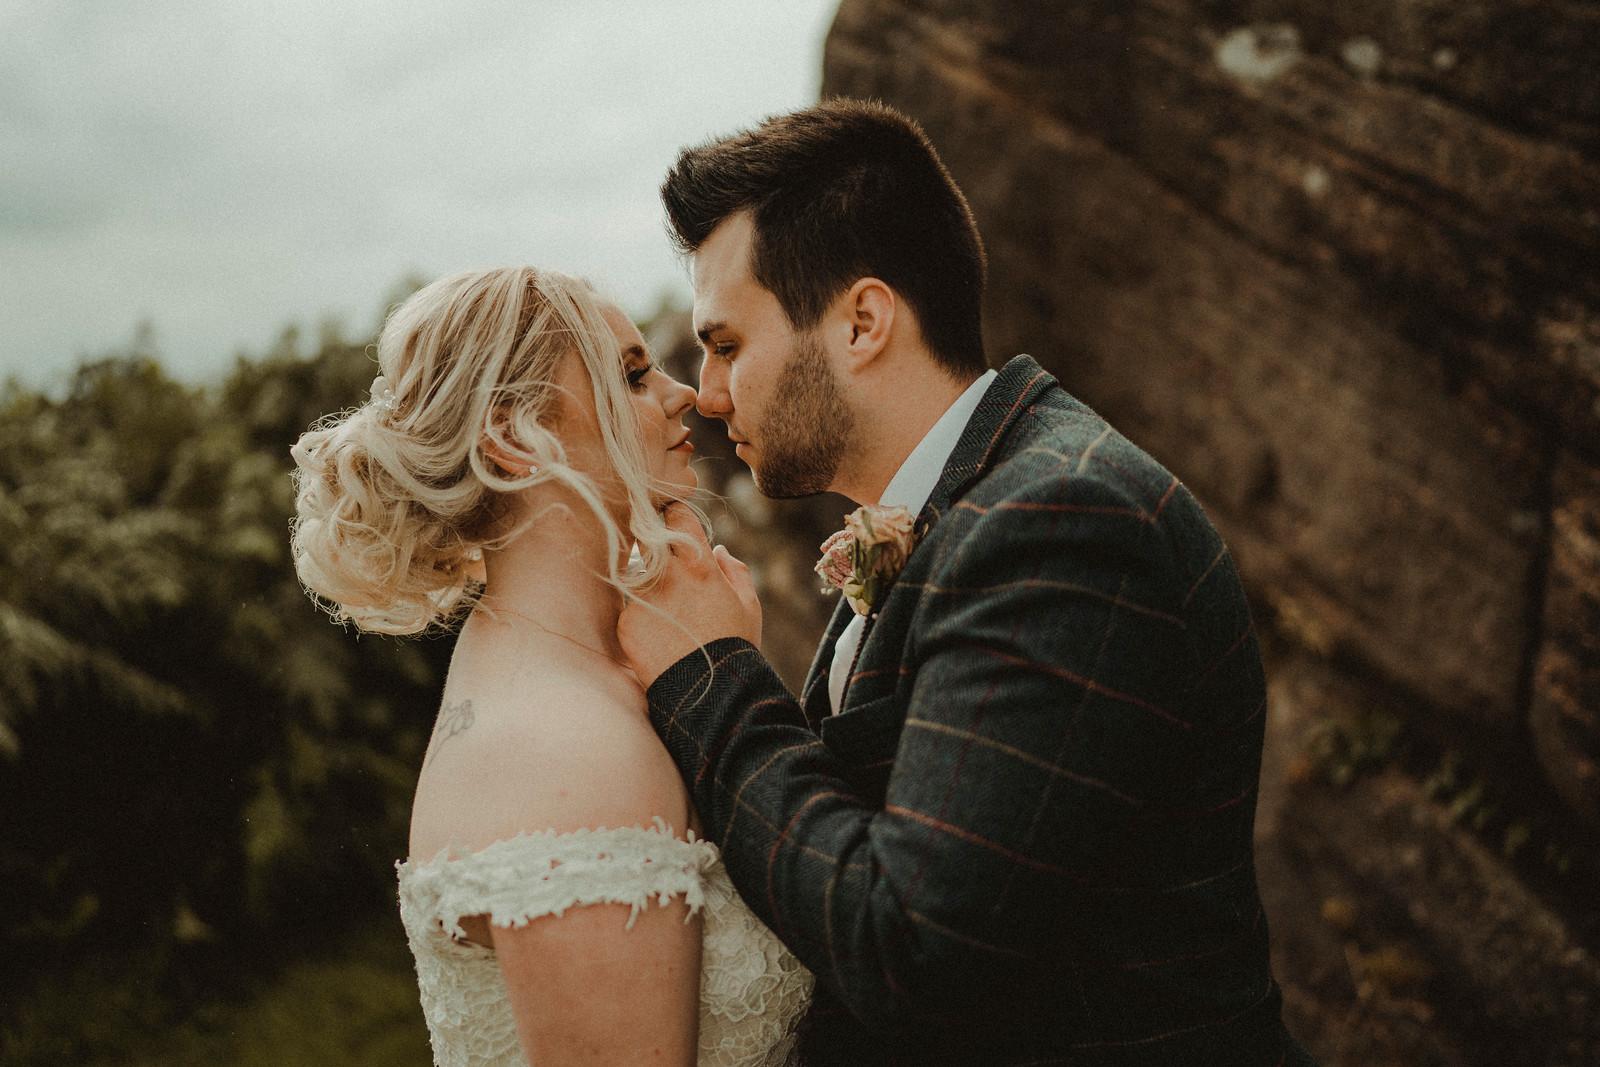 Bride and Groom Romantic Wedding Photo - Wedding Photographers and Videographers Edinburgh